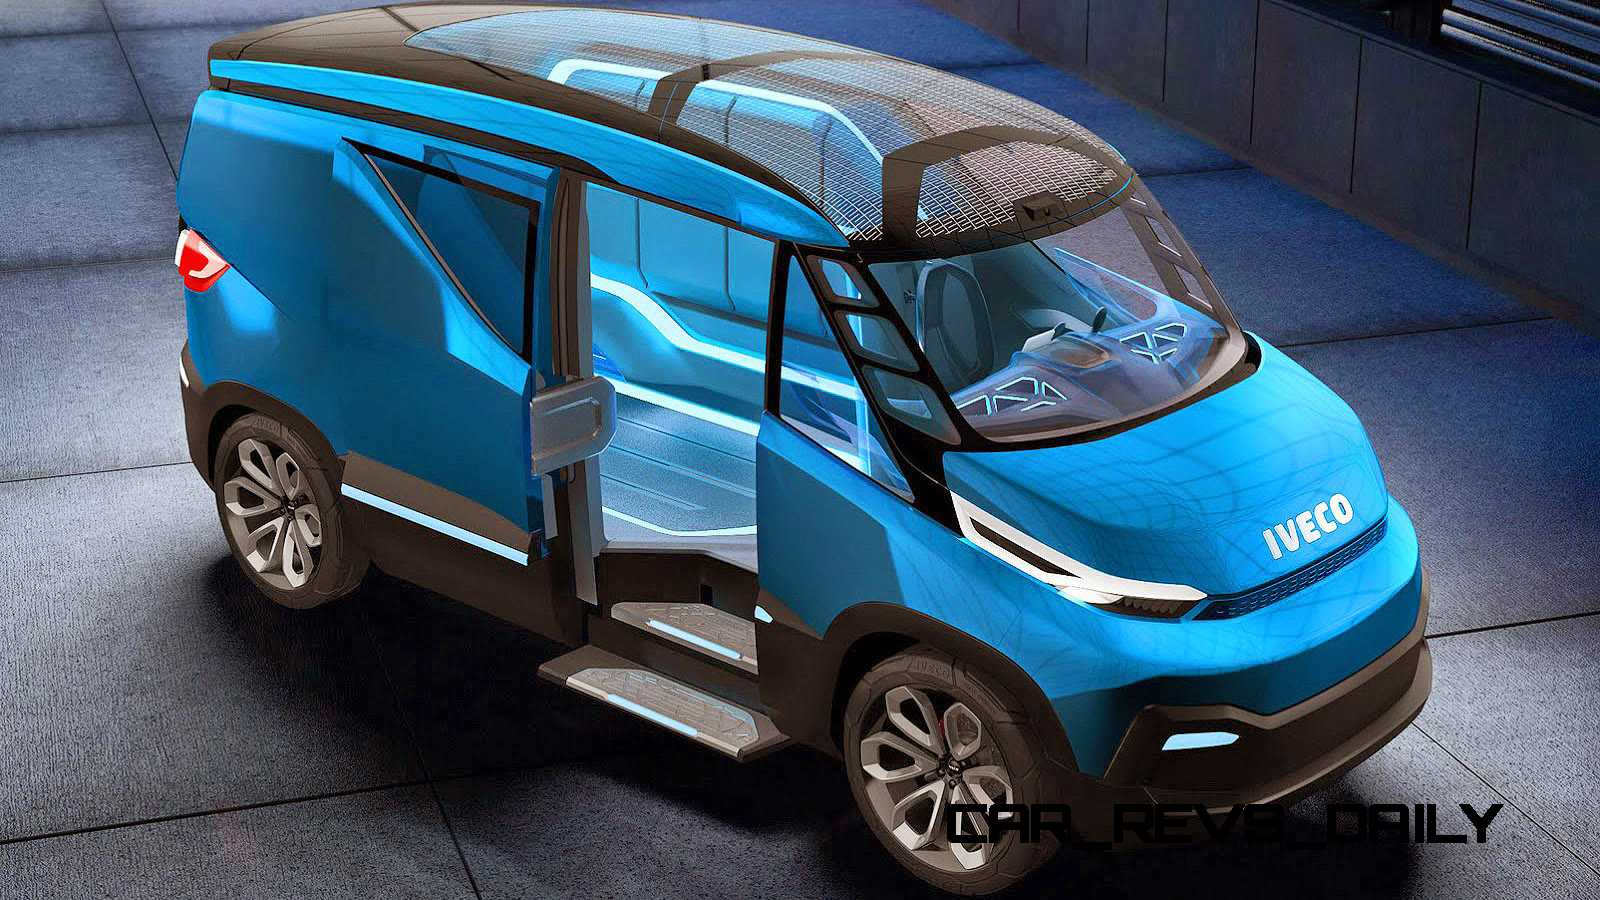 2015 IVECO Vision Concept Van 8